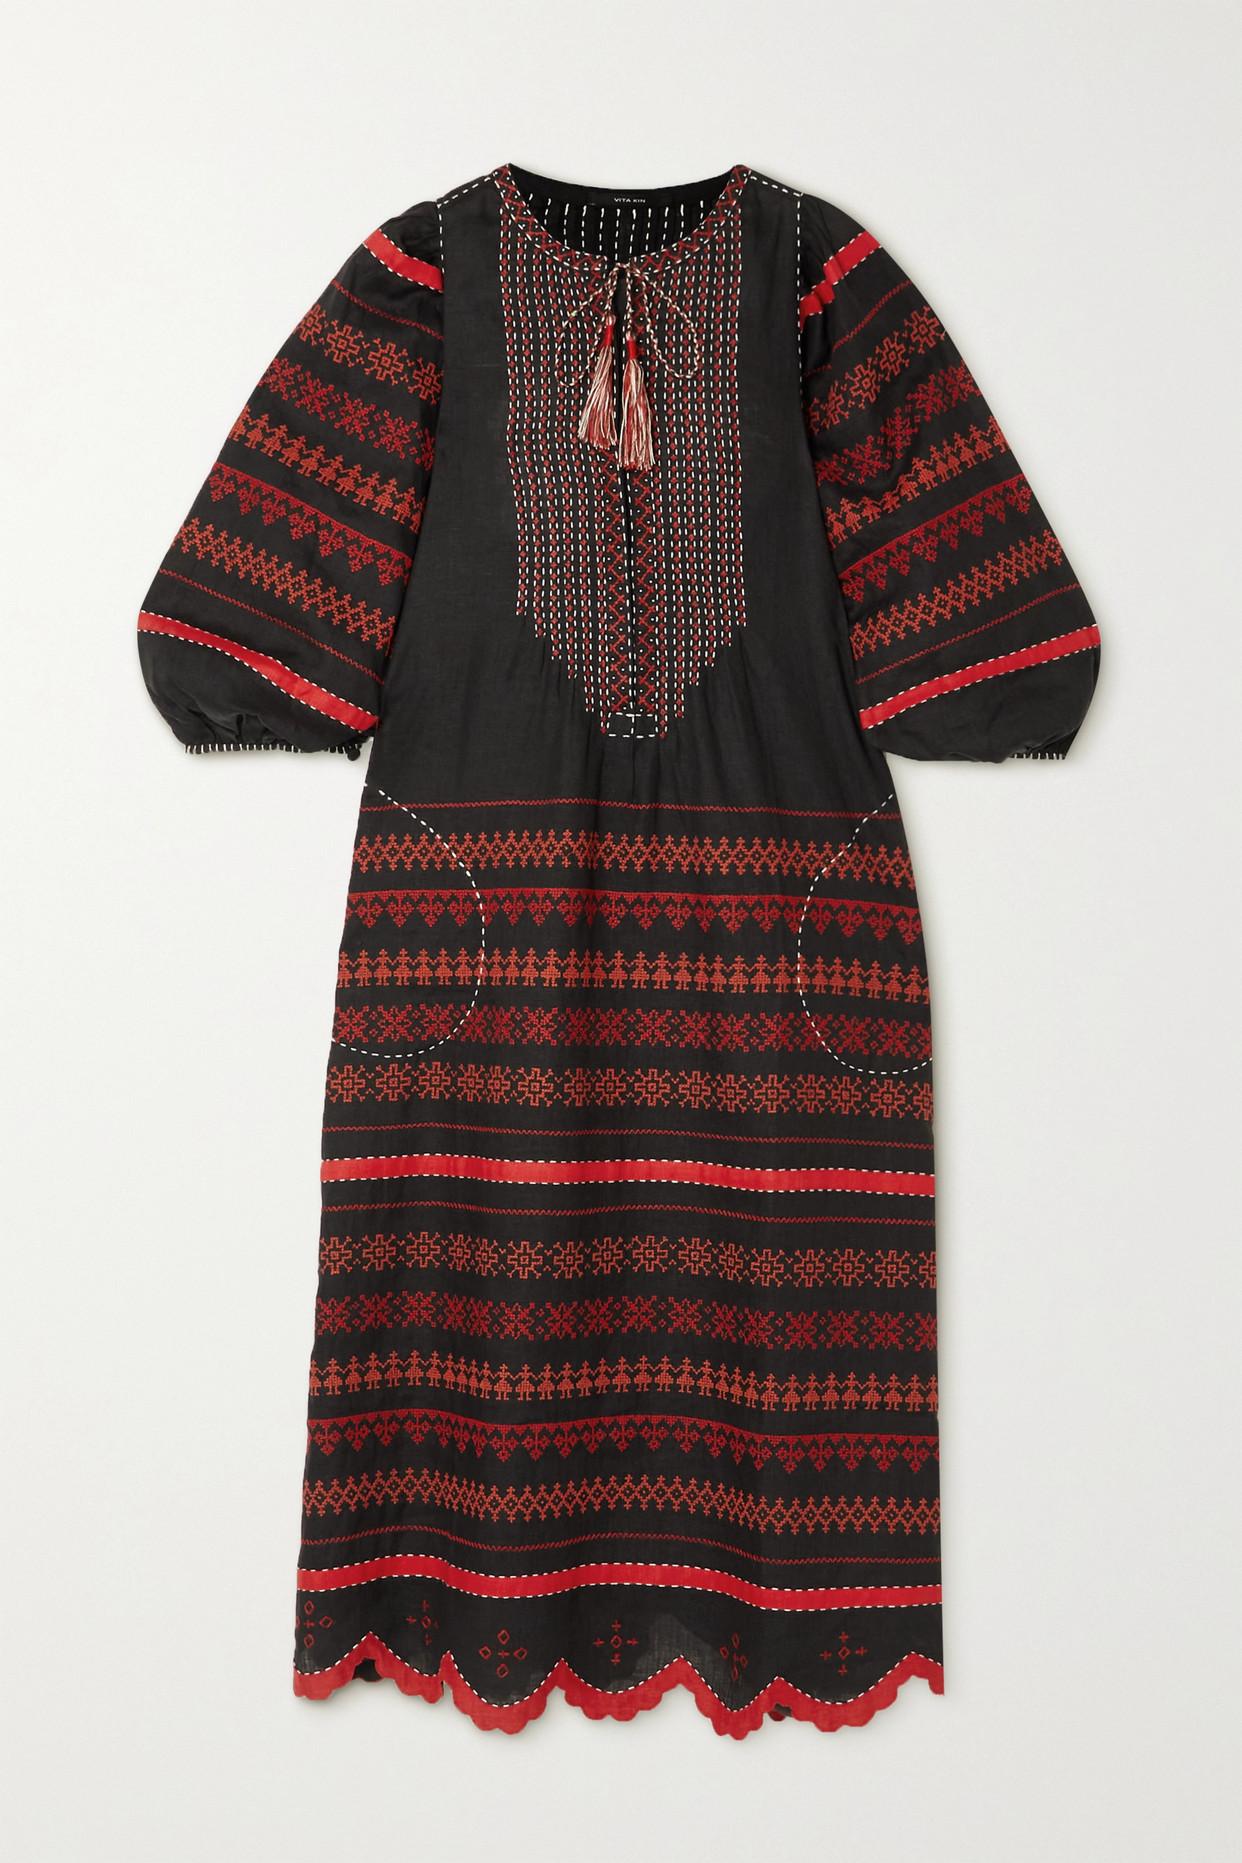 VITA KIN - Belarus Tasseled Embroidered Linen Midi Dress - Black - small